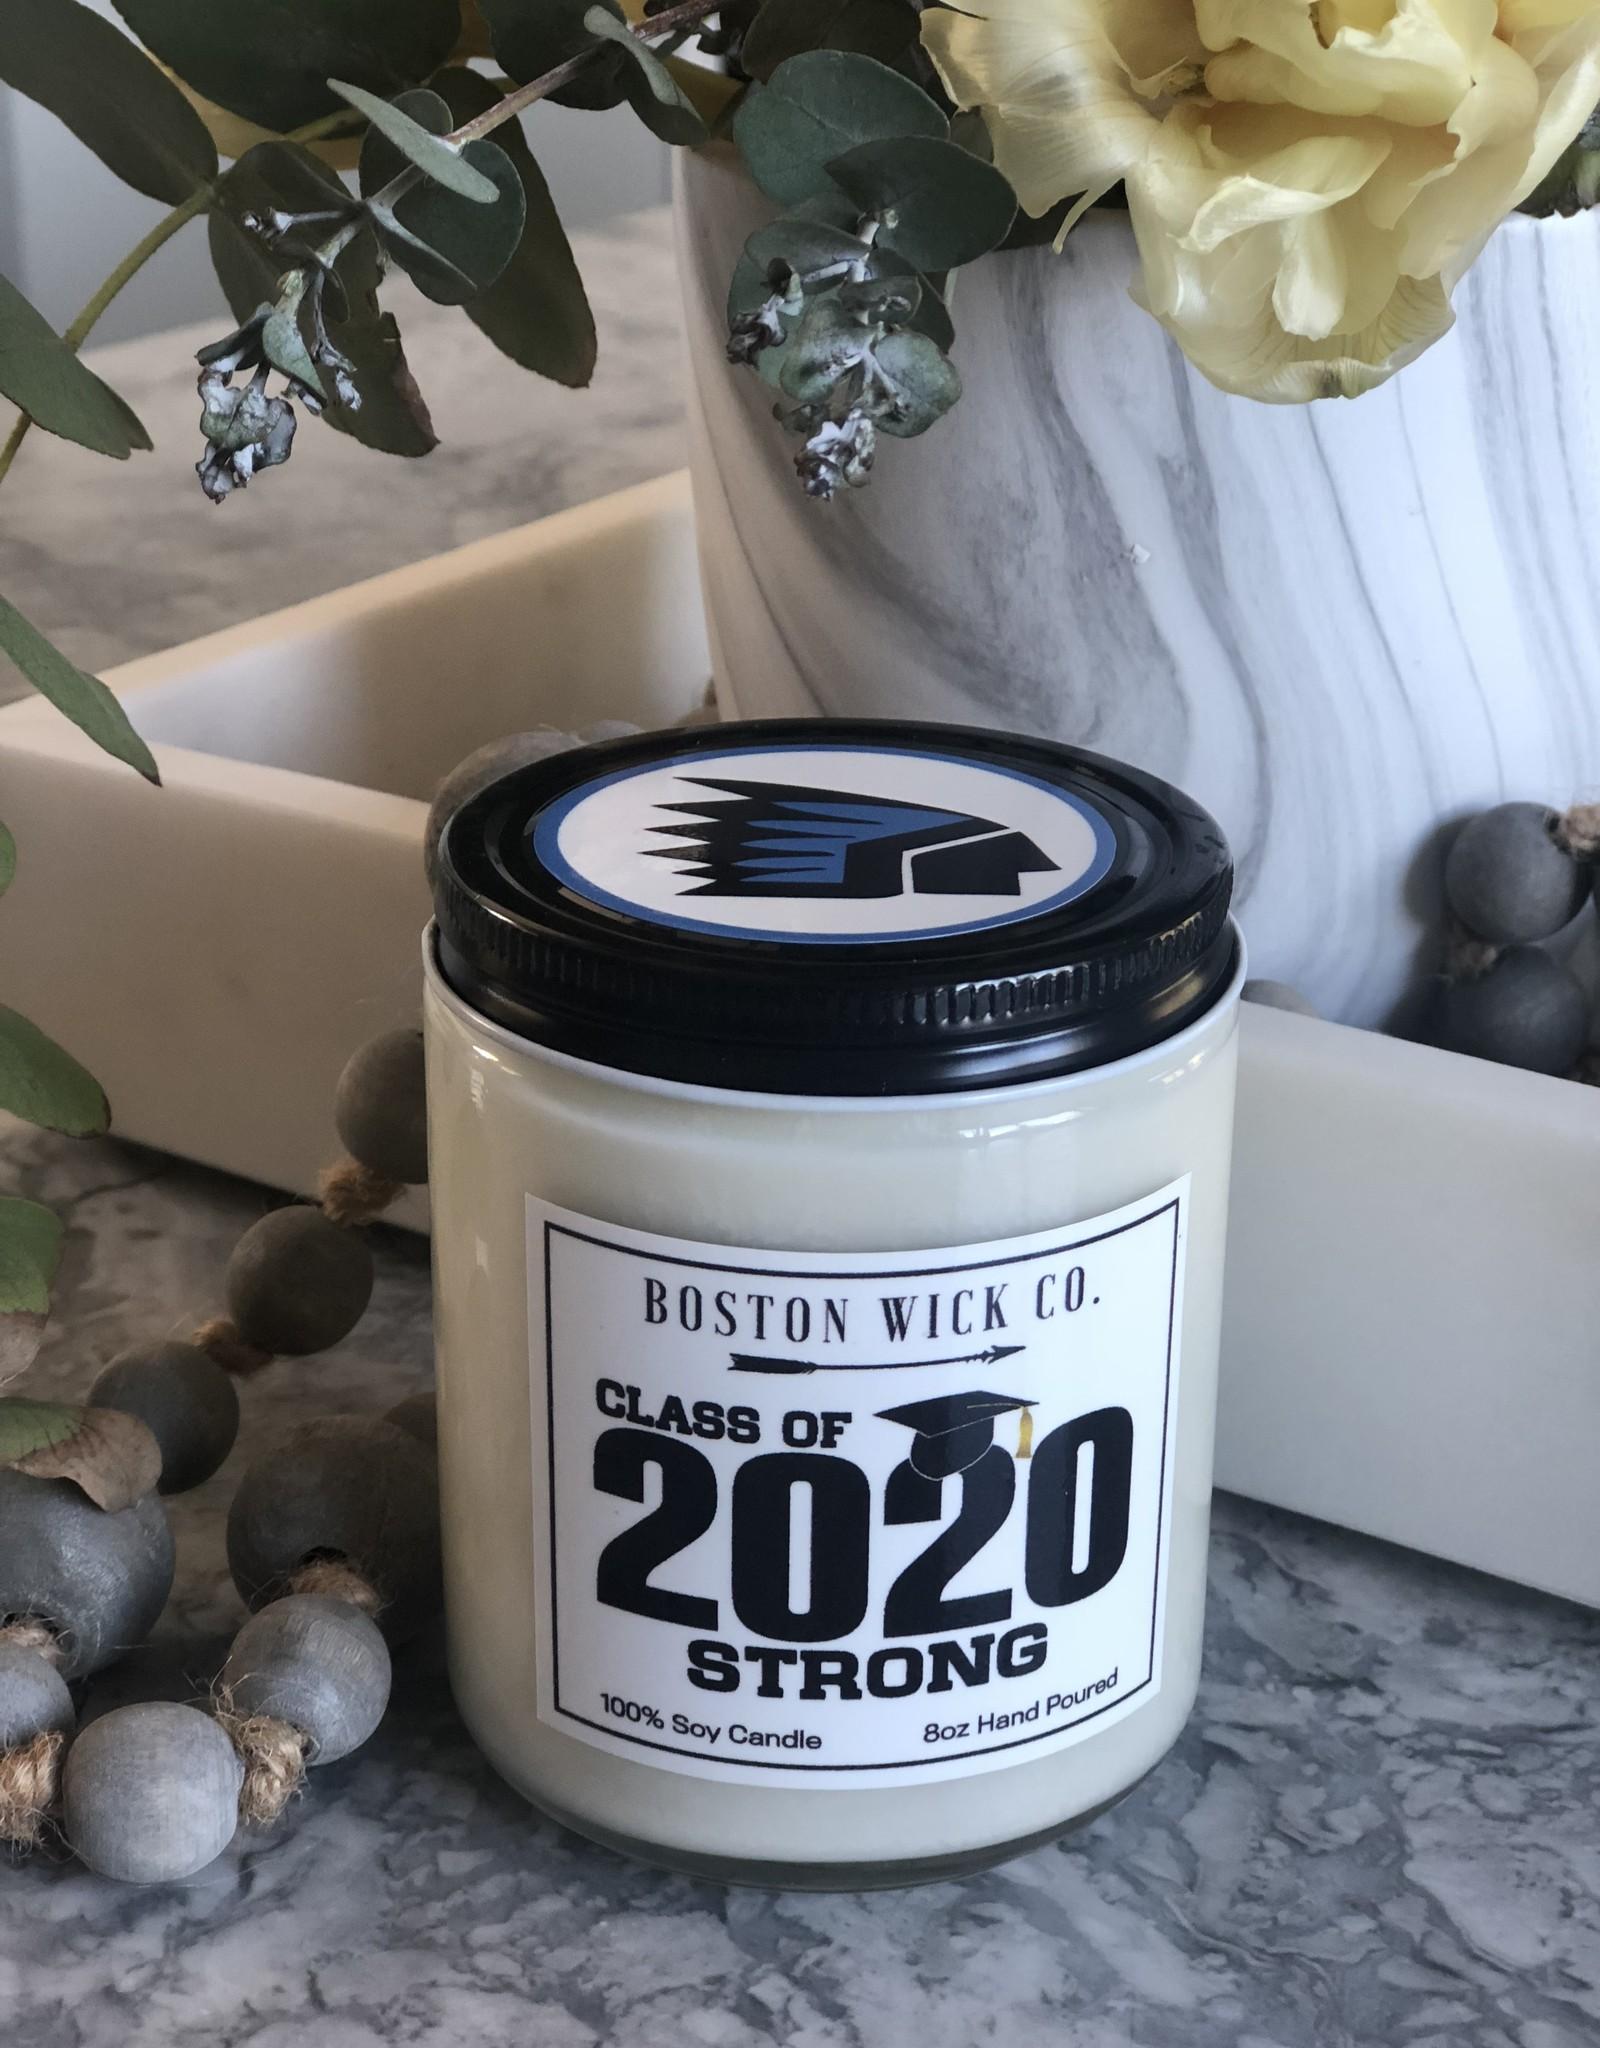 Boston Wick Boston Wick Co - Medfield Class of 2020 Candle